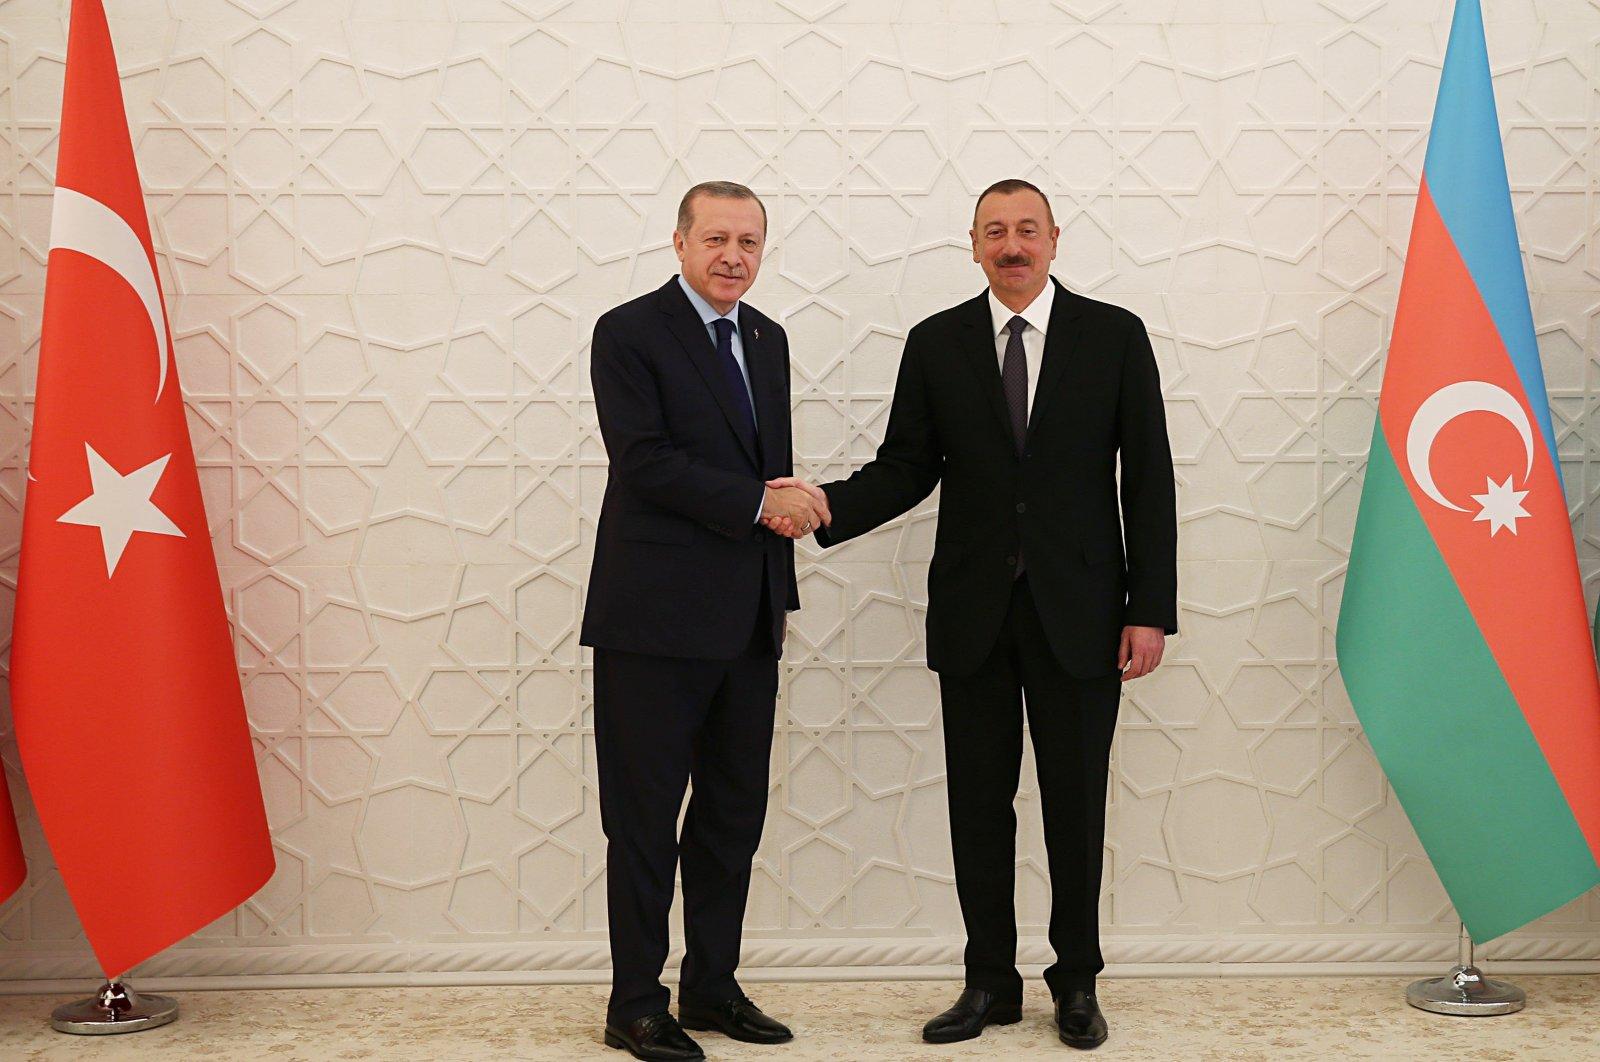 President Recep Tayyip Erdoğan and Azerbaijani President Ilham Aliyev, Oct. 31, 2017. (AA Photo)